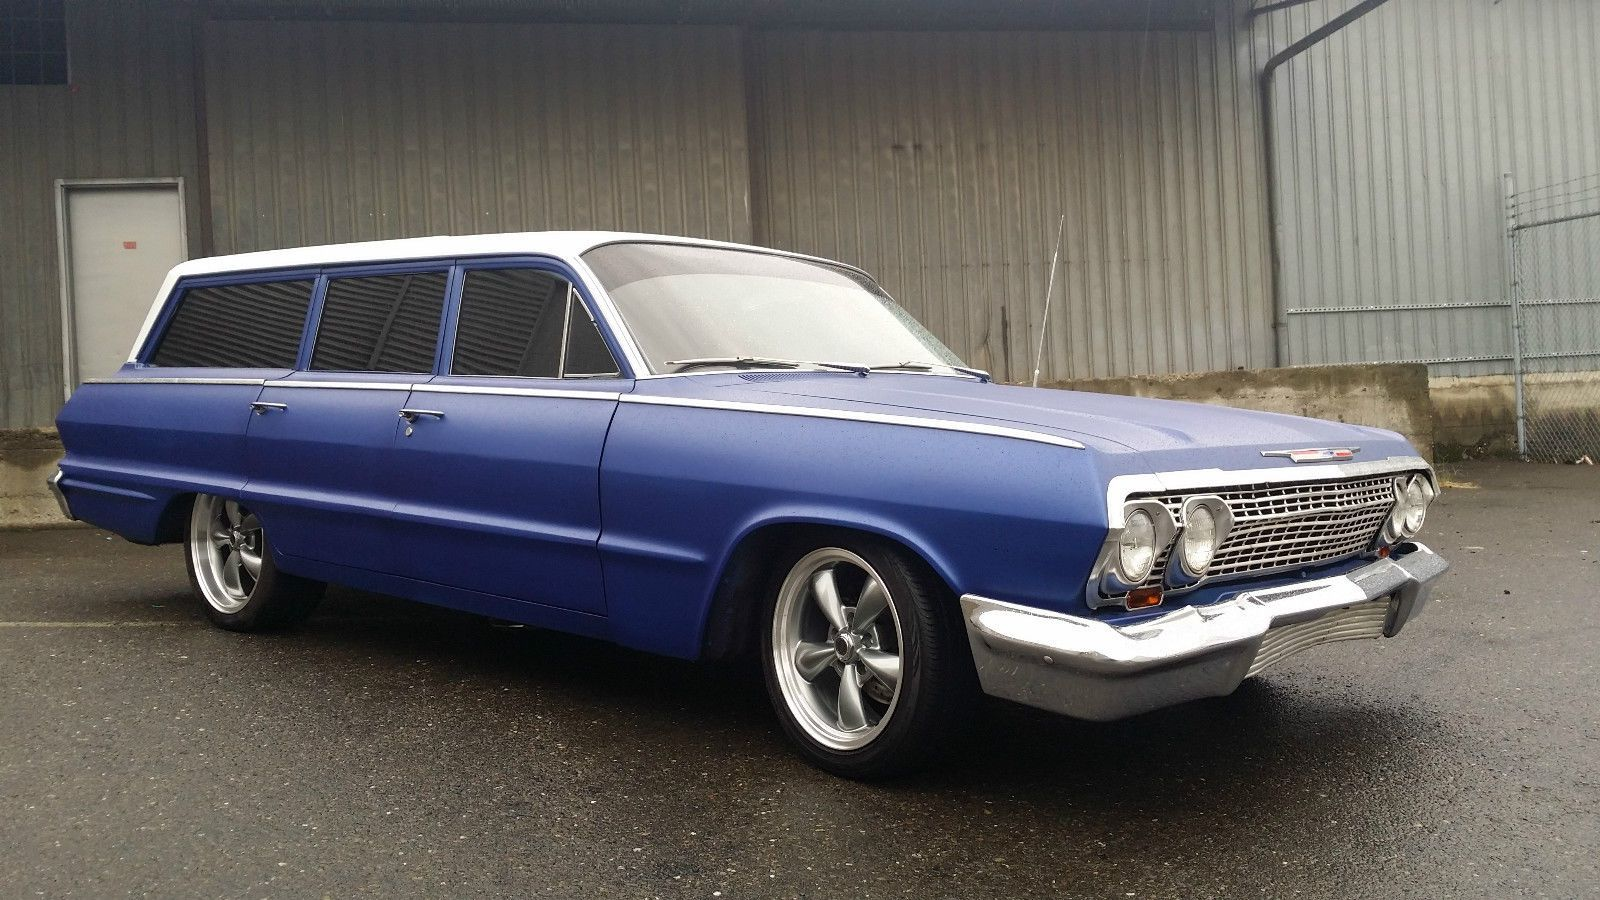 '63 Chevrolet Biscayne Wagon